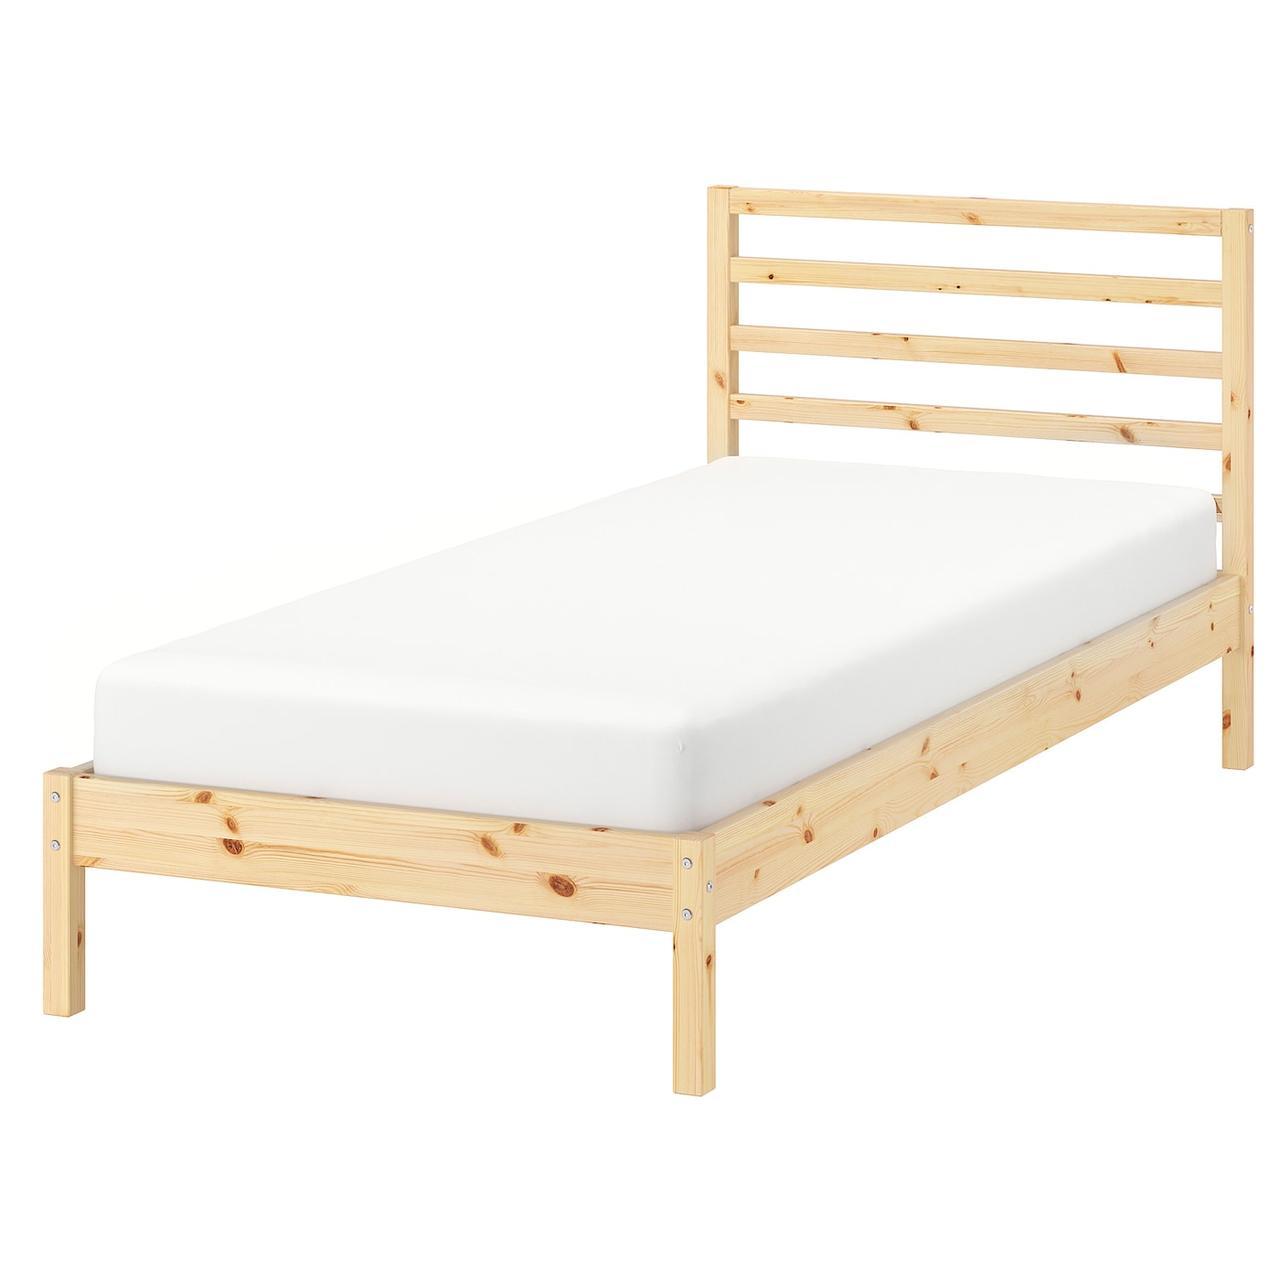 TARVA ТАРВА Каркас ліжка 90x200 см